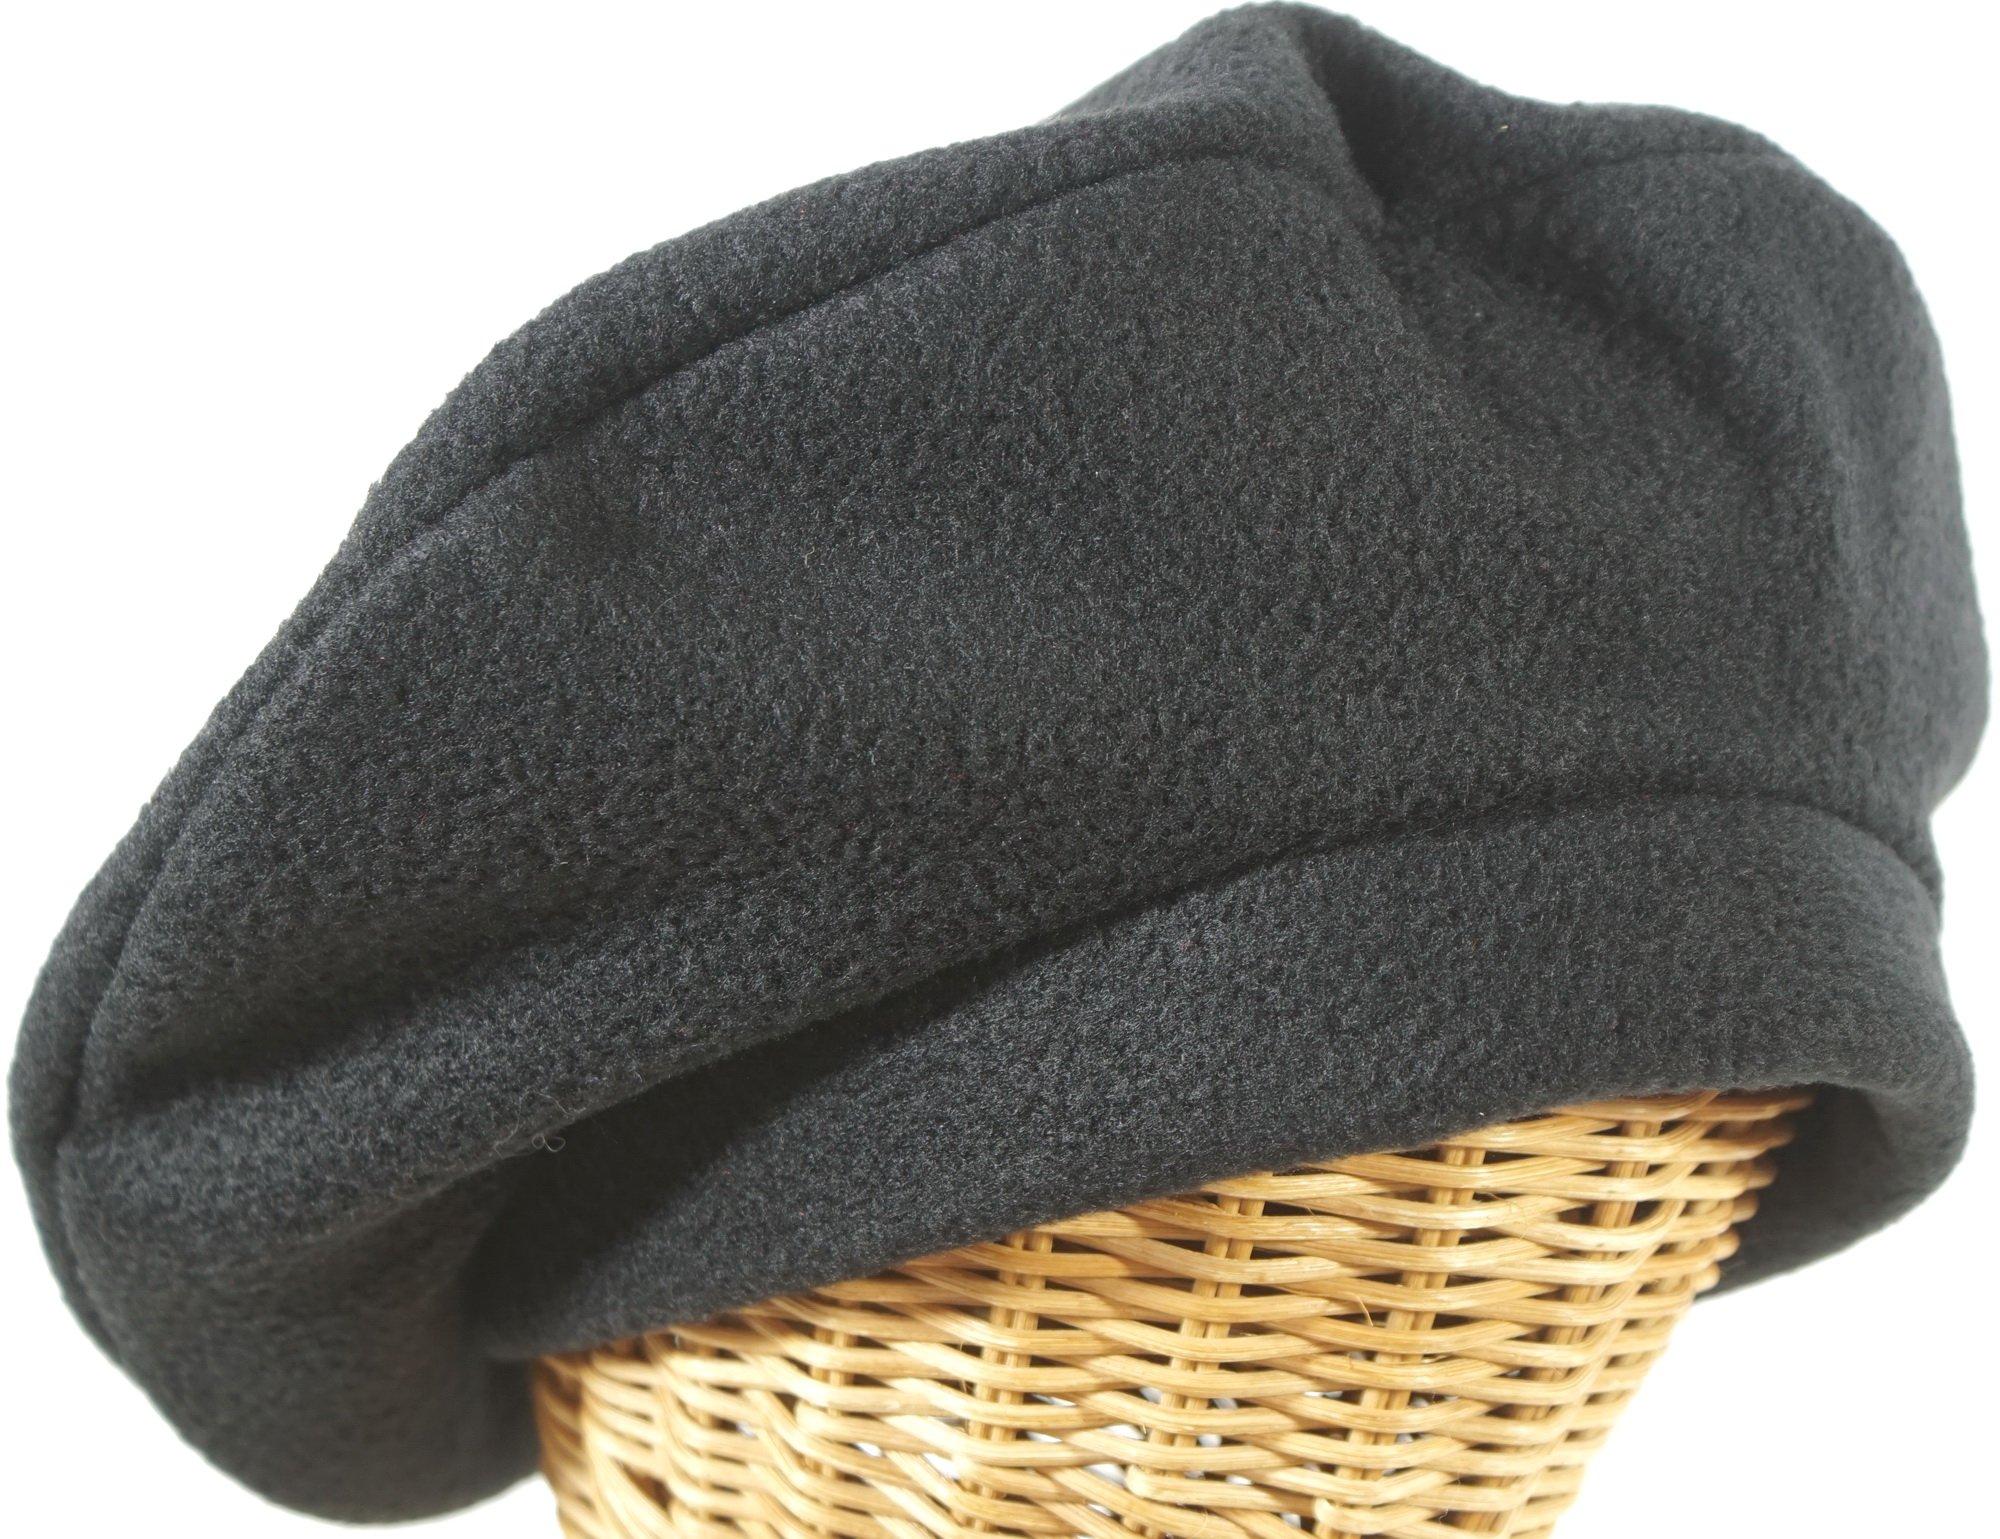 Hat Stuff Loft Fleece Beret In Black Made In Massachusetts